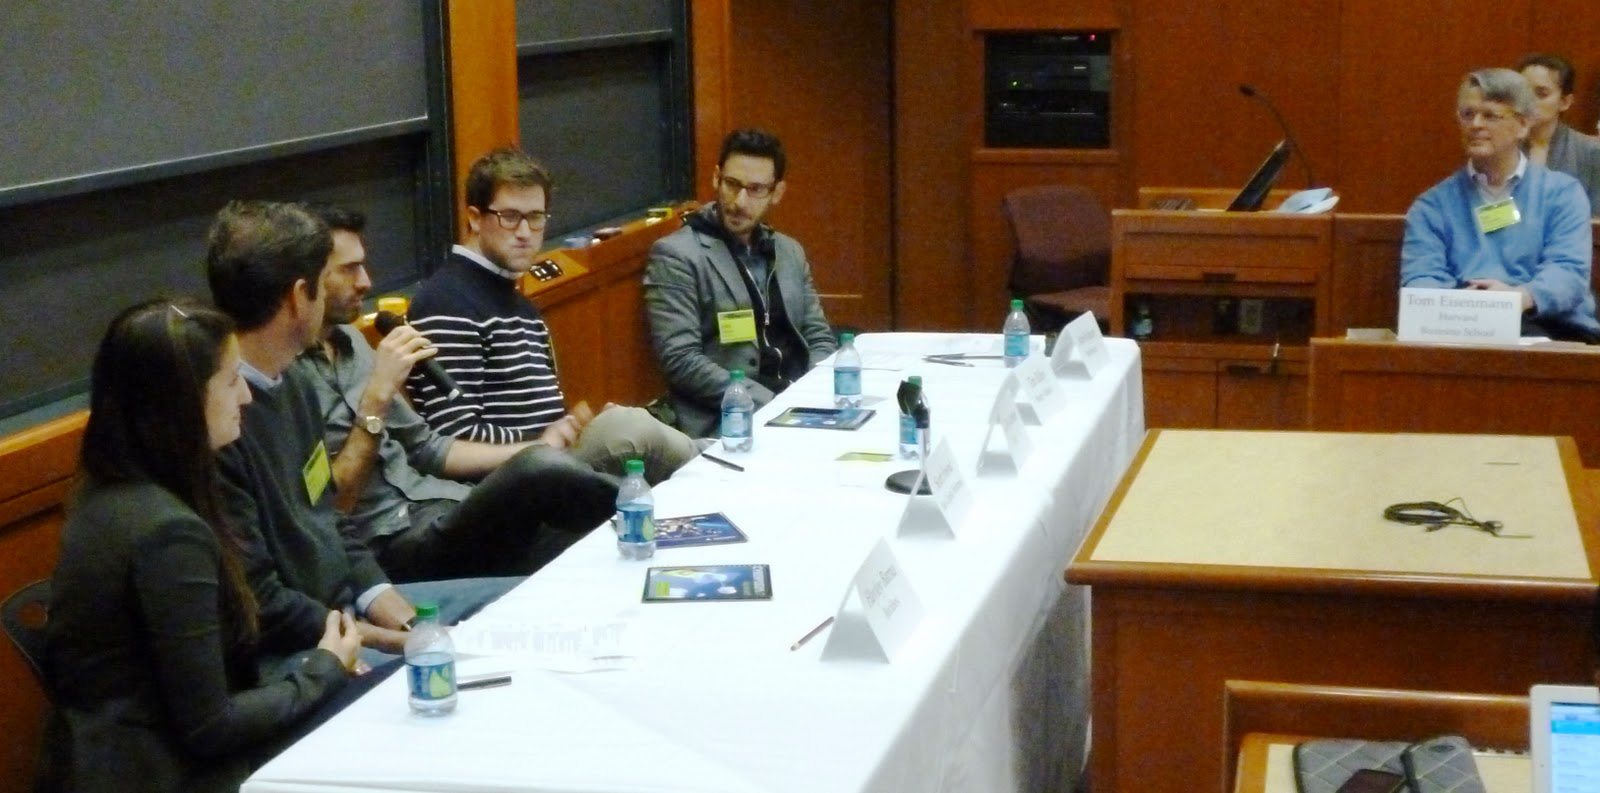 Cyberposium 2014 November 1 2014 Harvard Business School Panel